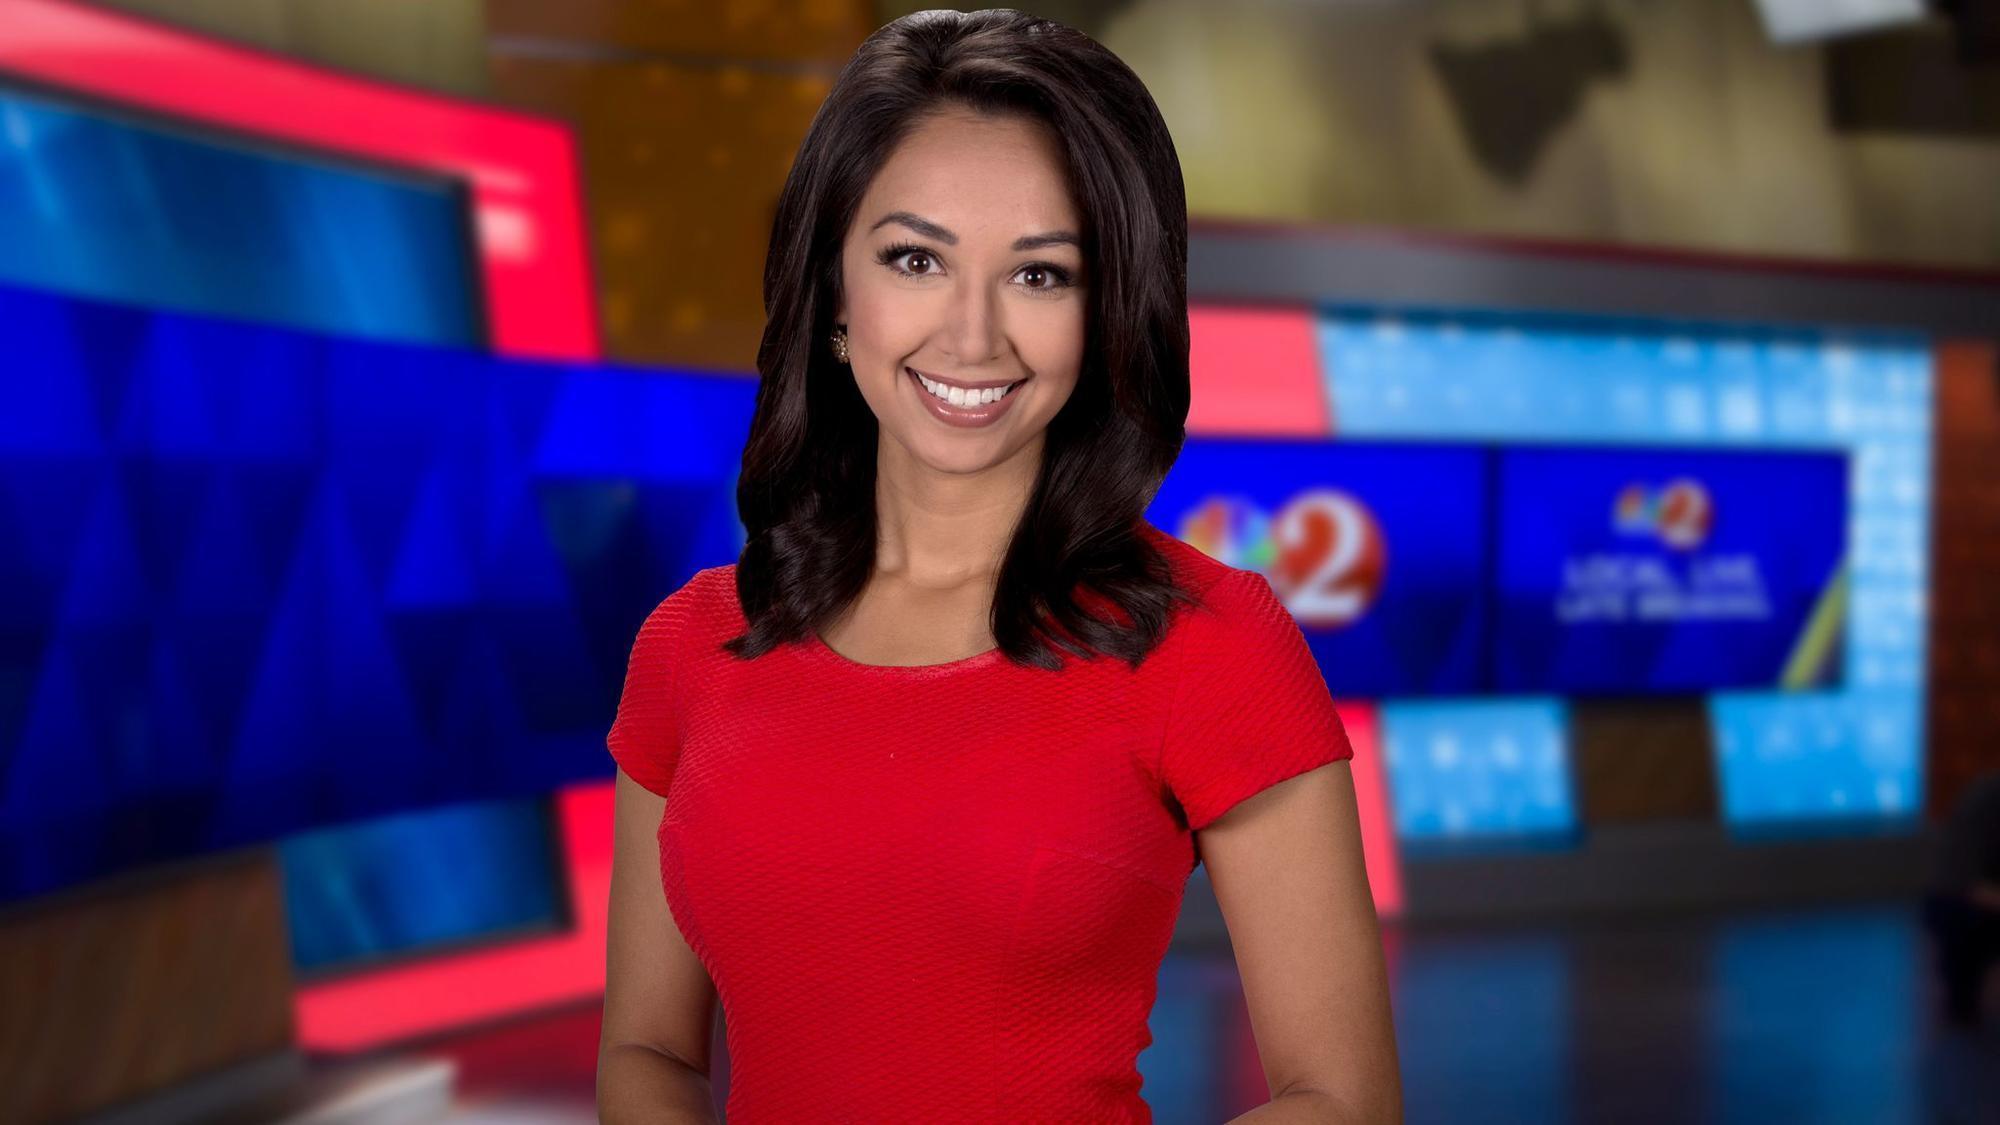 Nbc News West Palm Beach